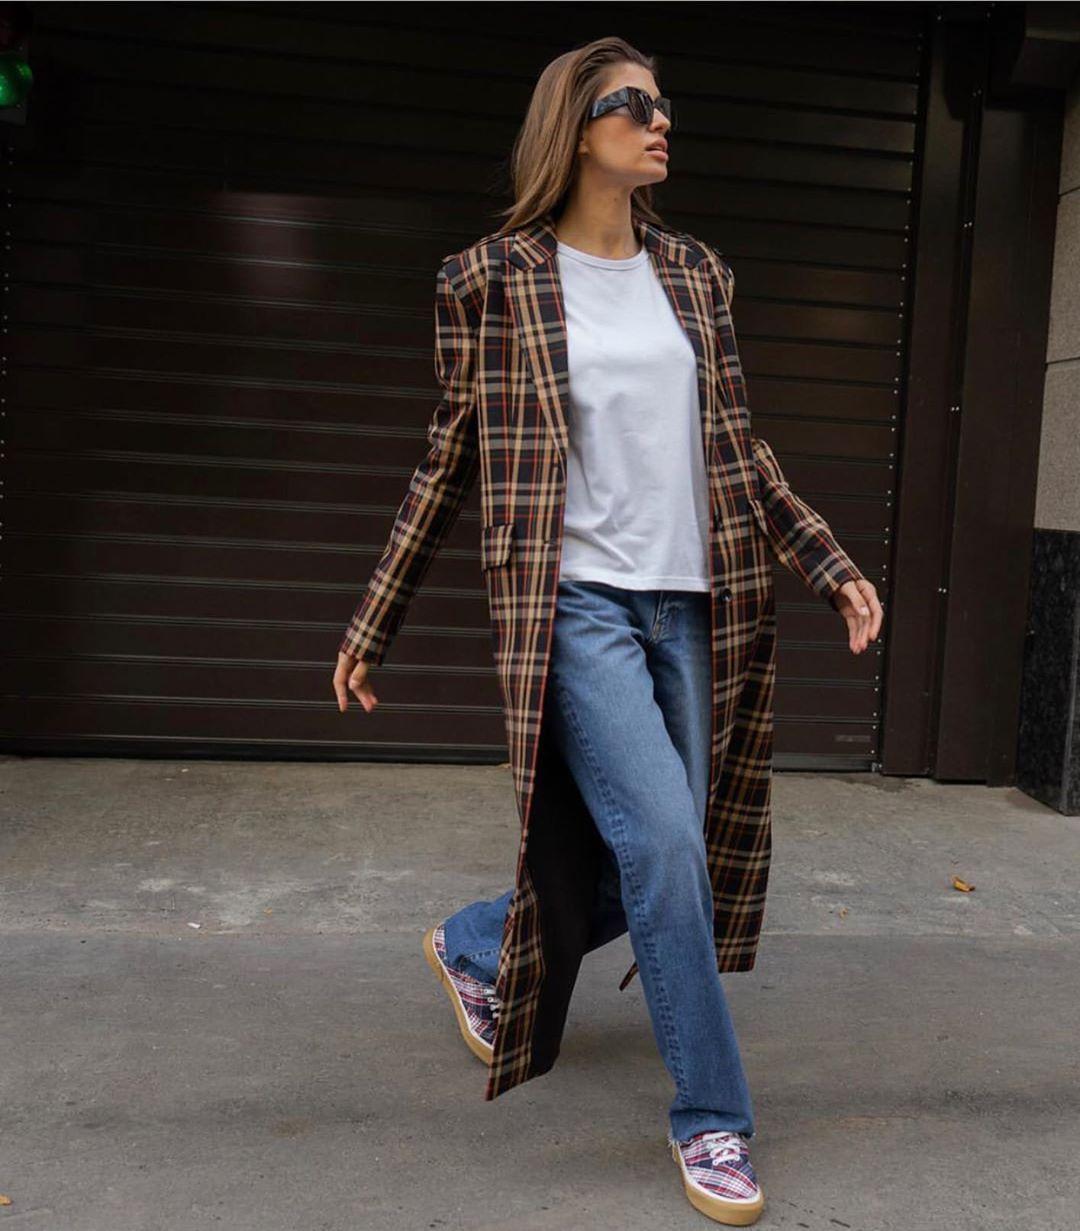 "QDRESSCODE®️ on Instagram: ""Autumn 🍂 colors 🍂 Via @yuliawave.brand #love #style #streetstyle #girl #model #picoftheday #fashion #instalike #blogger #fashionista…"""